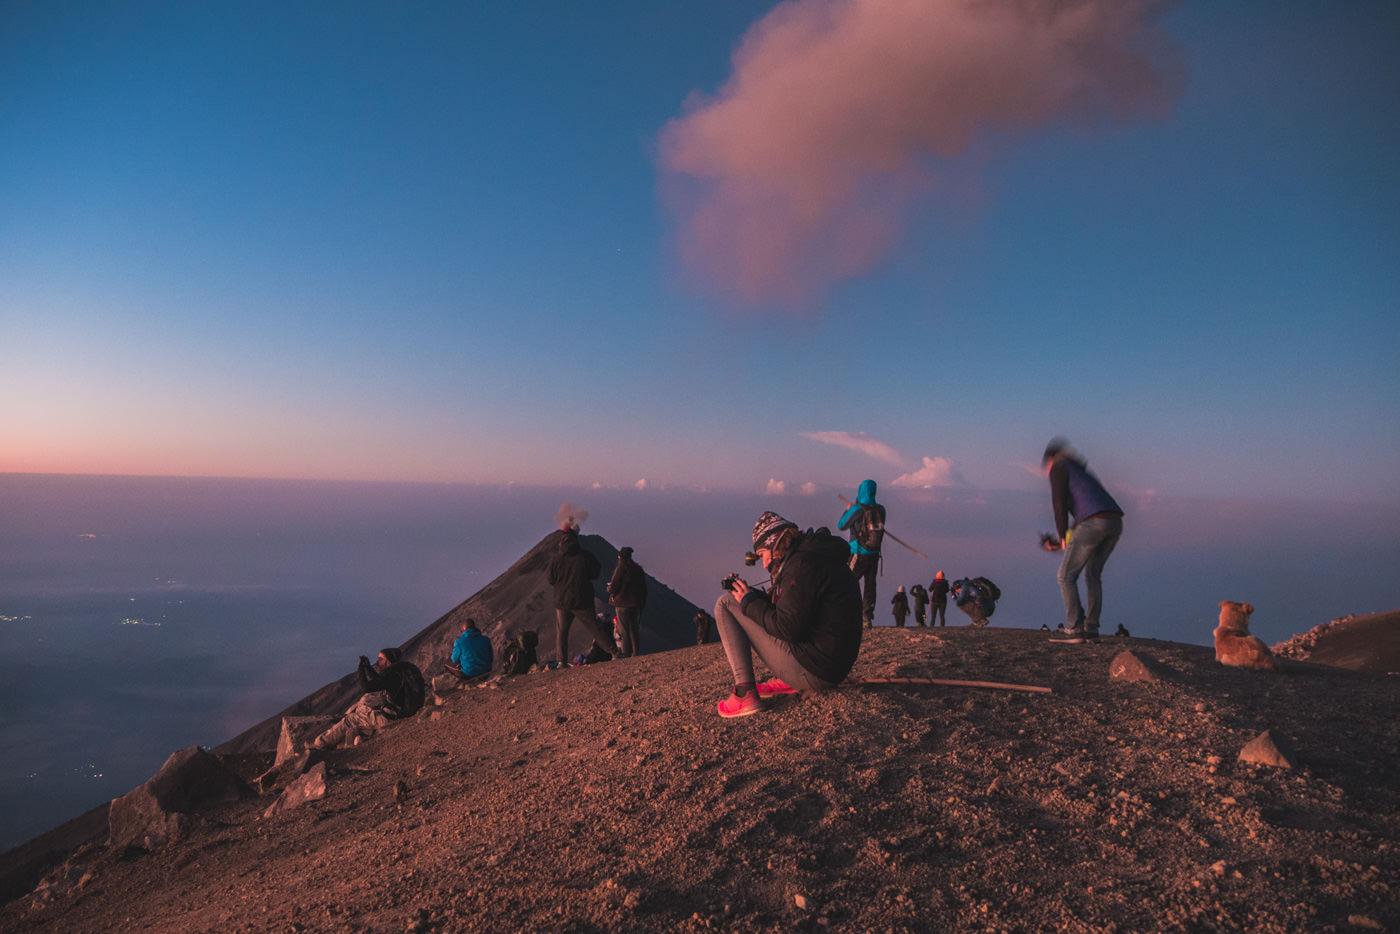 Auf dem Gipfel des Vulkan Acatenango in Guatemala